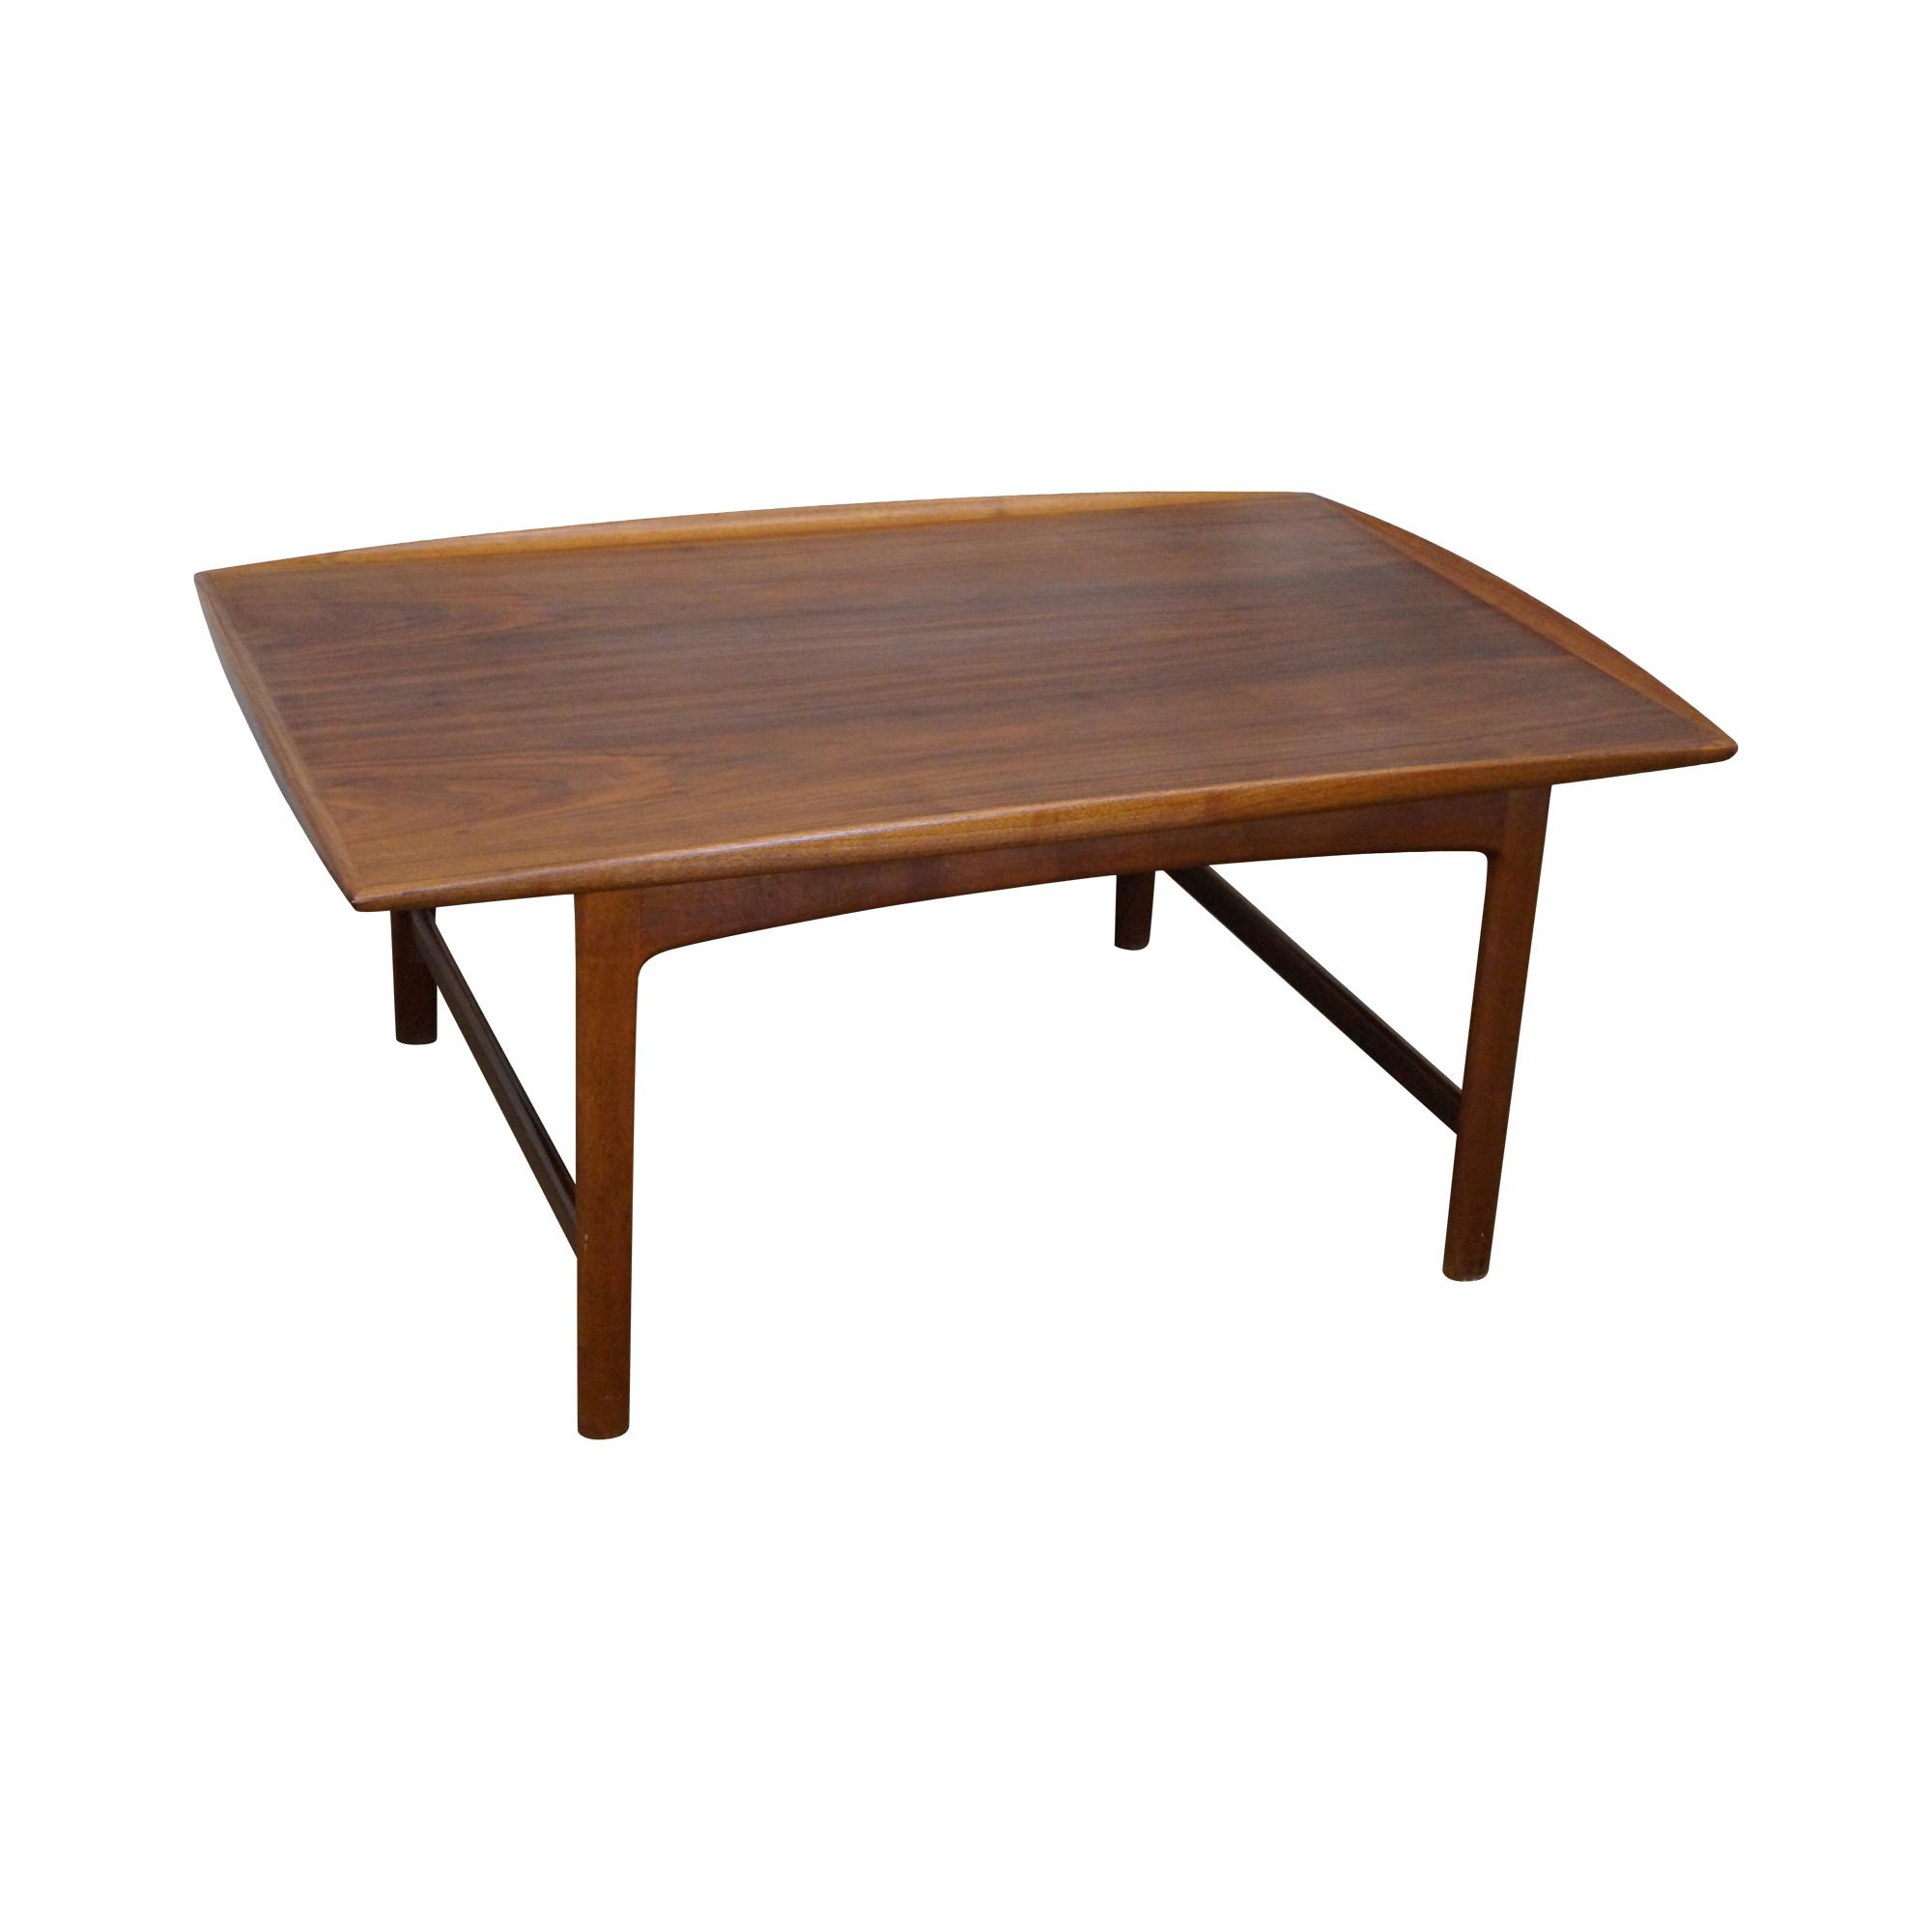 fulke ohlsson for dux danish teak coffee table | chairish